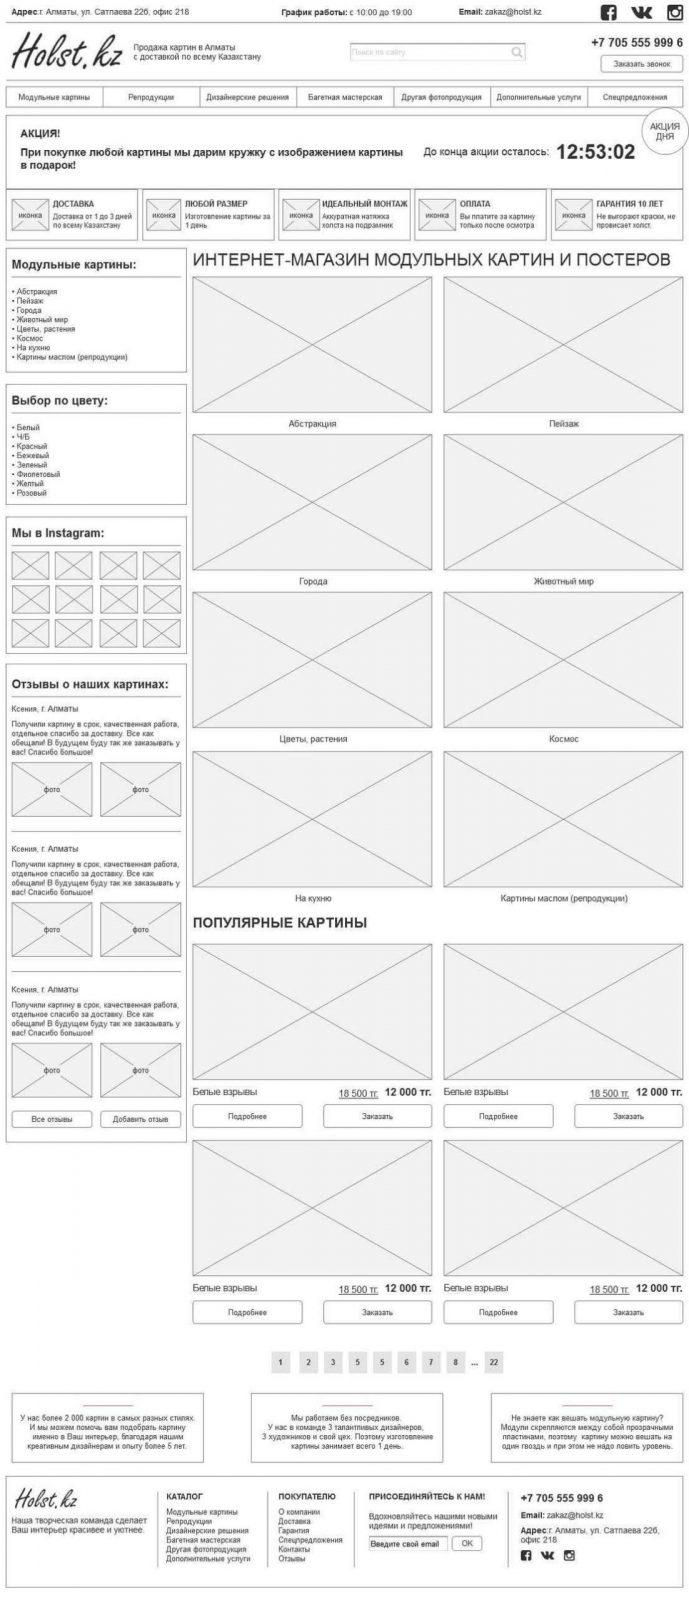 Прототип сайта модульных картин